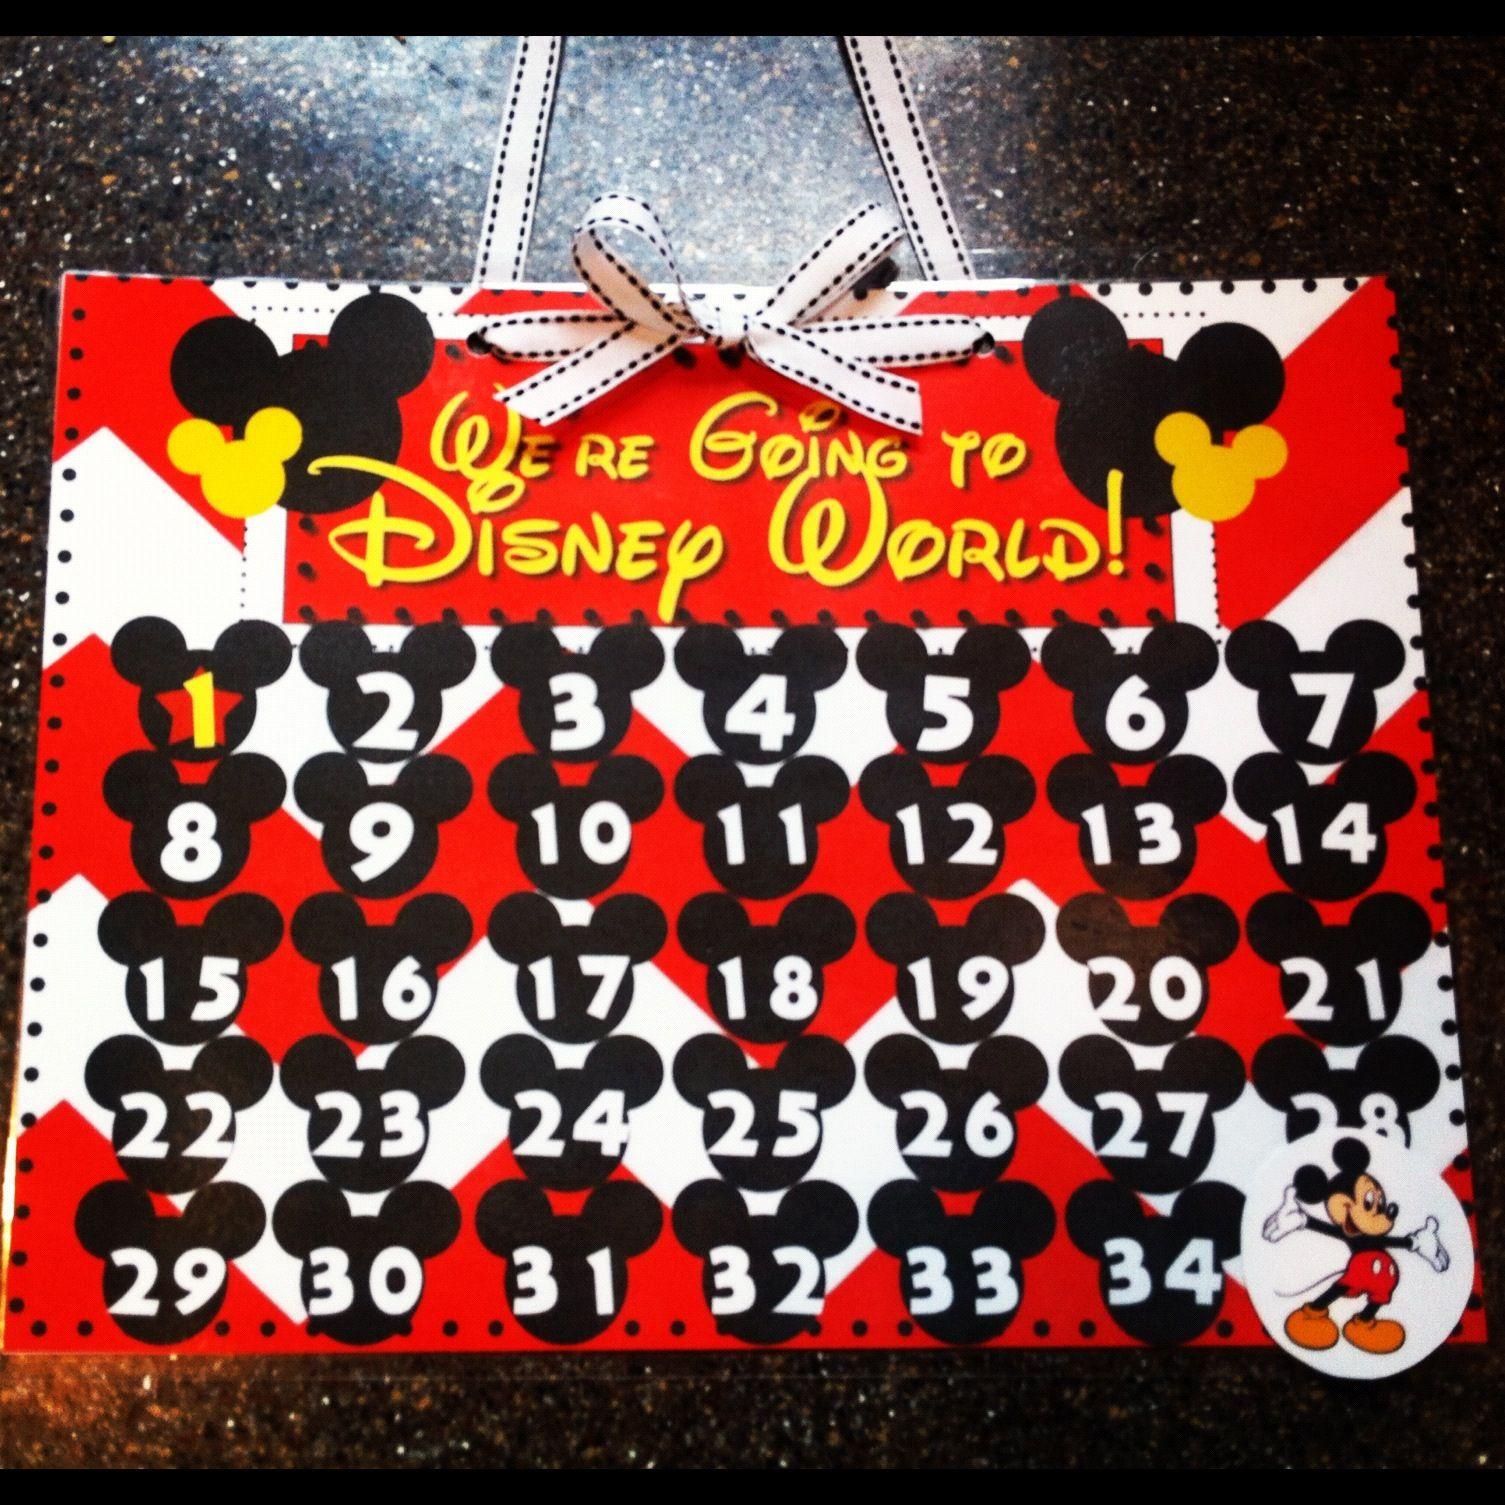 photograph regarding Disney Countdown Printable titled Disney Countdown Calendar- Cost-free Printable Disney Disney